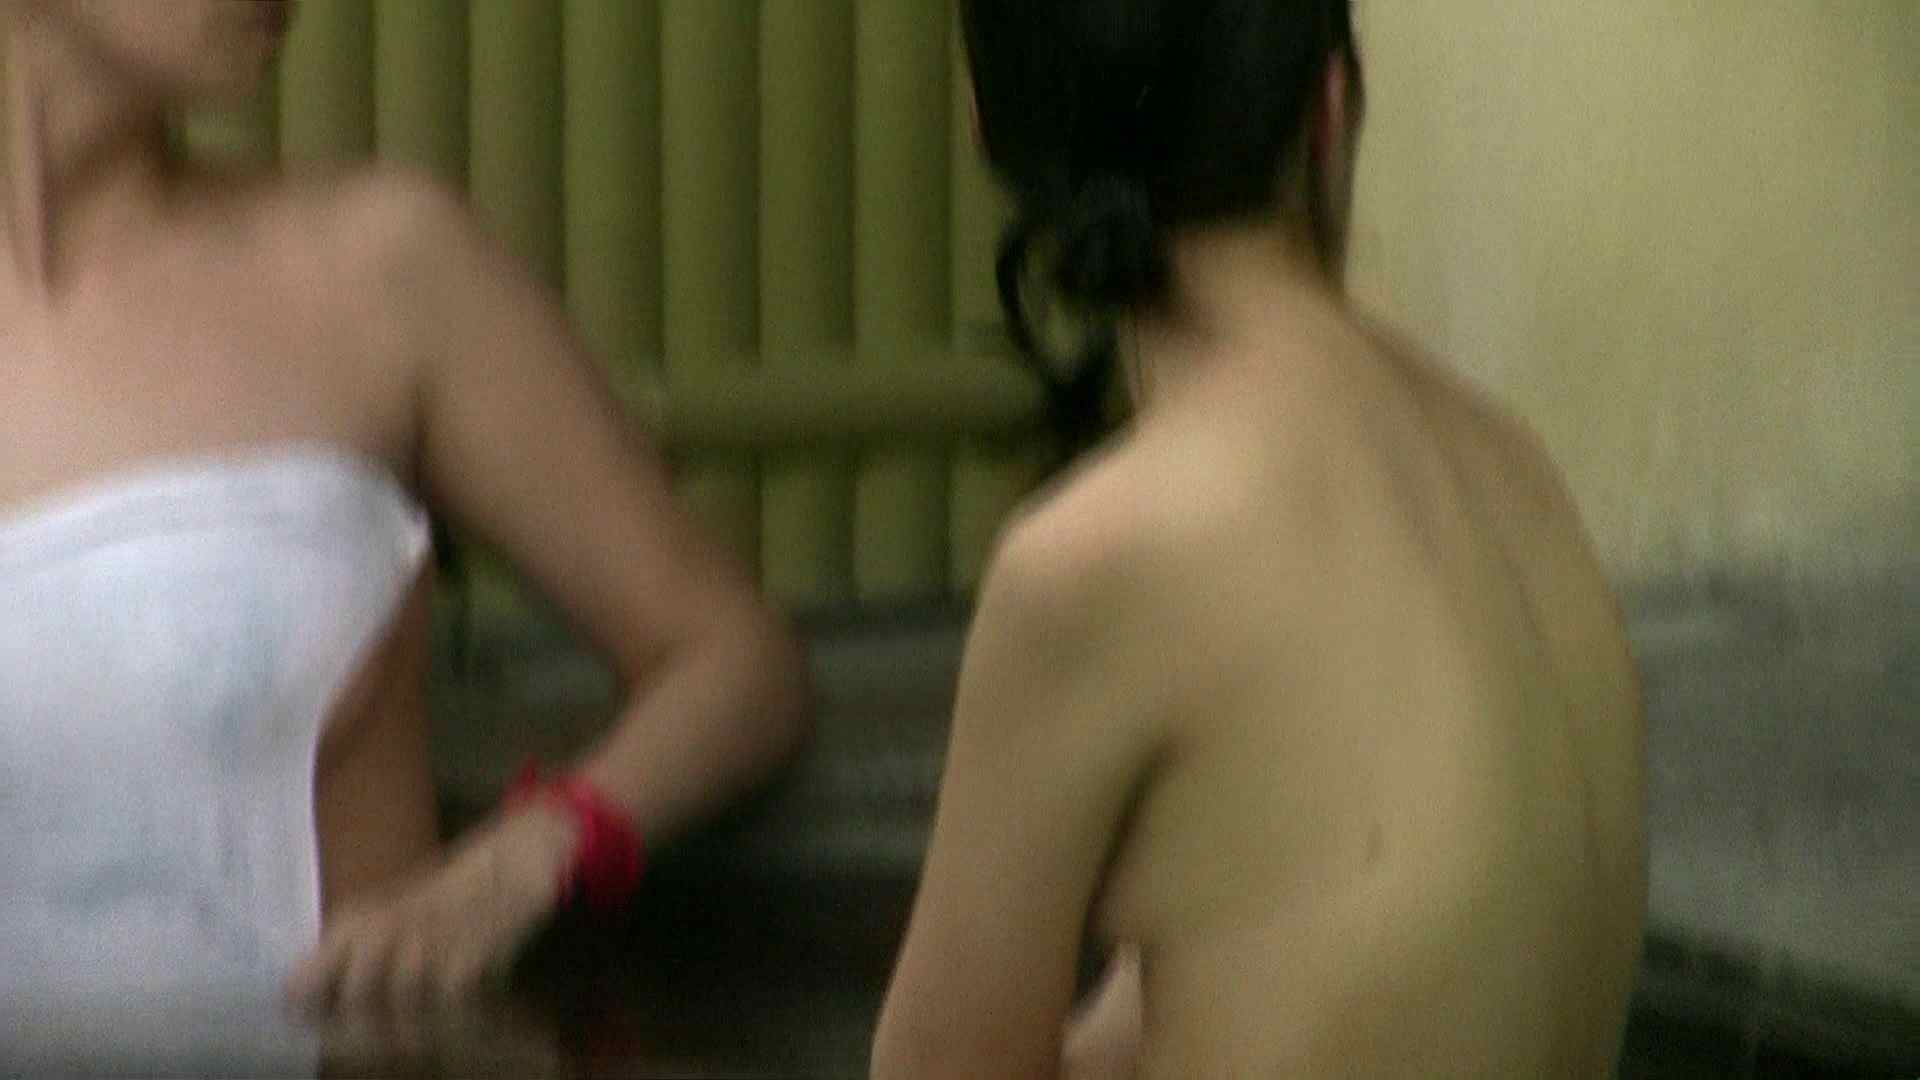 Aquaな露天風呂Vol.636 女体盗撮 盗み撮りSEX無修正画像 87連発 17